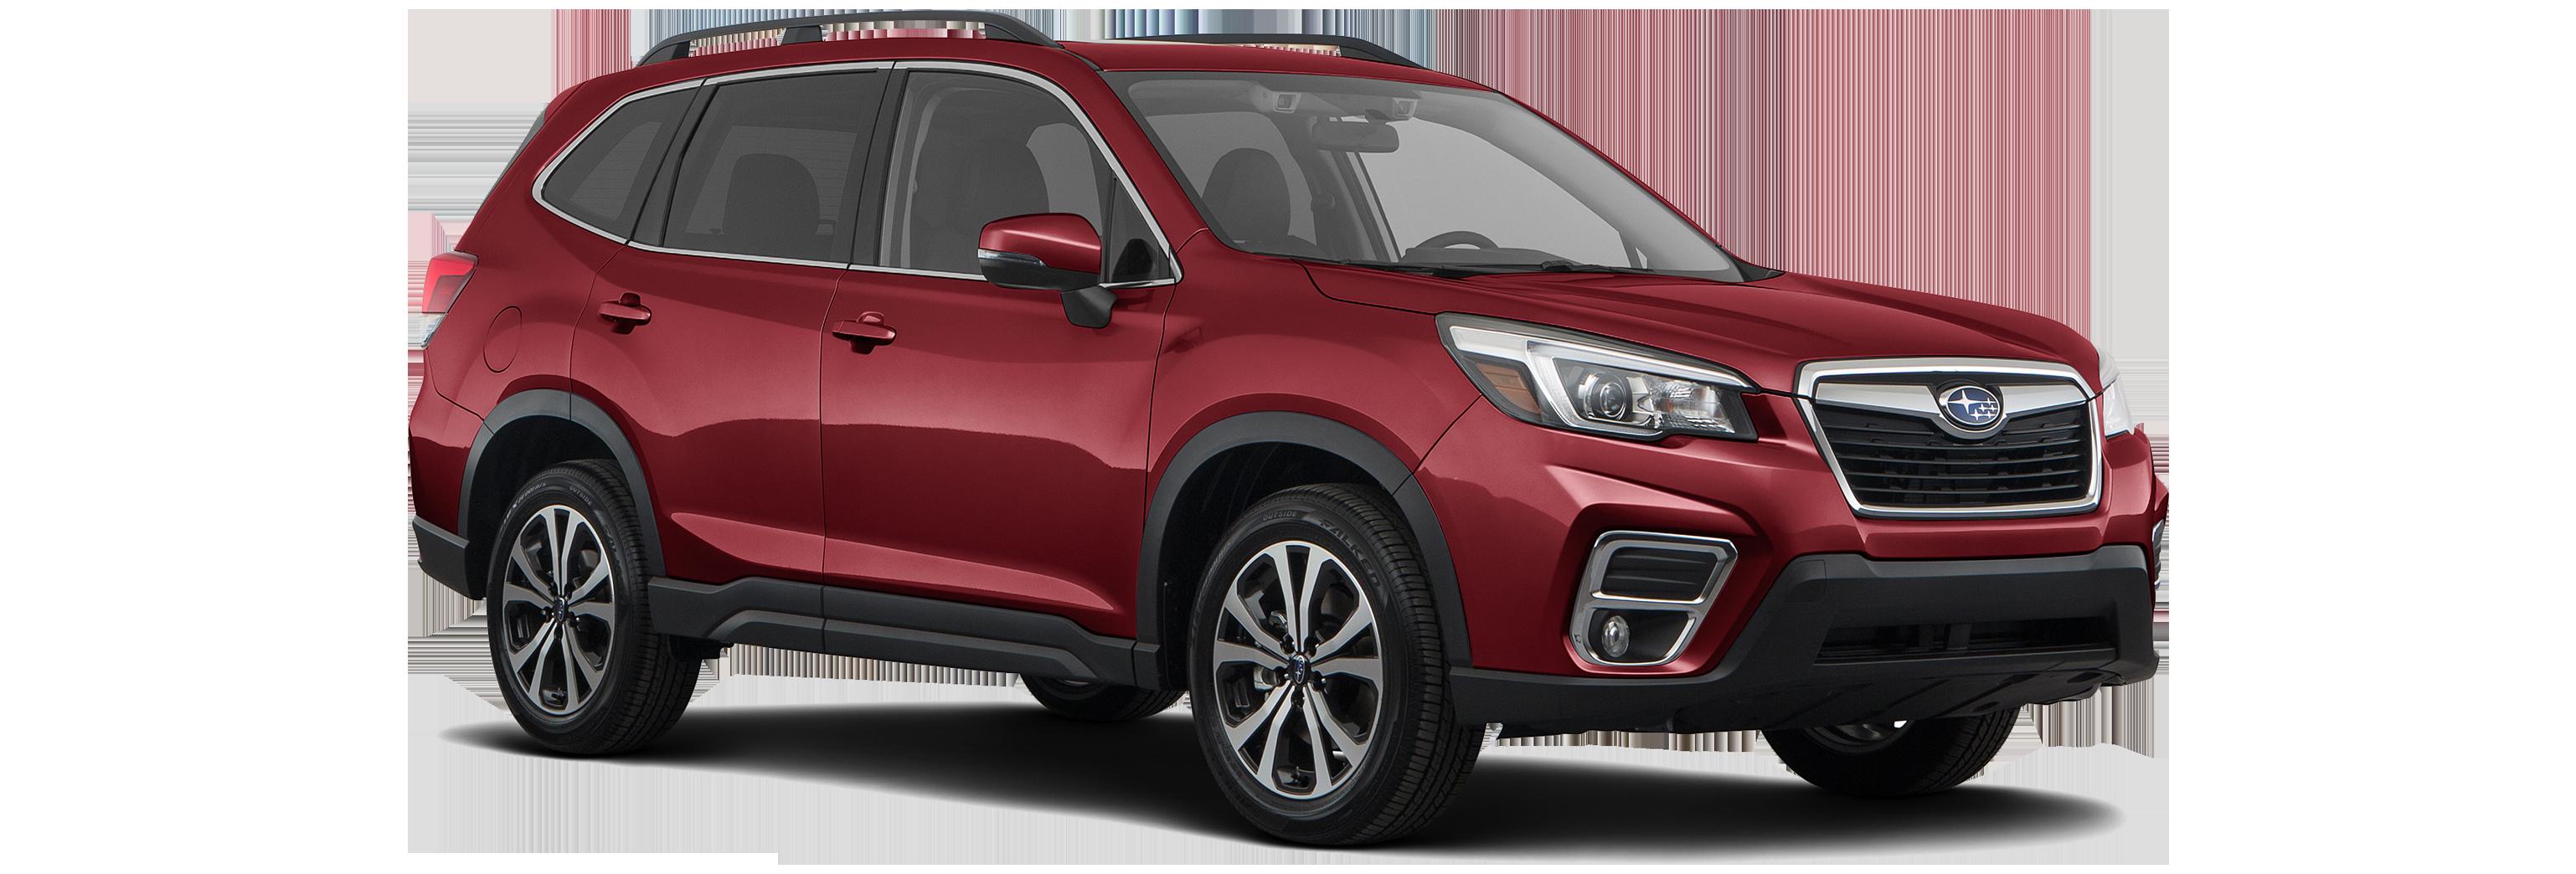 Walnut Creek Subaru >> 2019 Subaru Forester Model Overview | Livermore, CA | Livermore Subaru